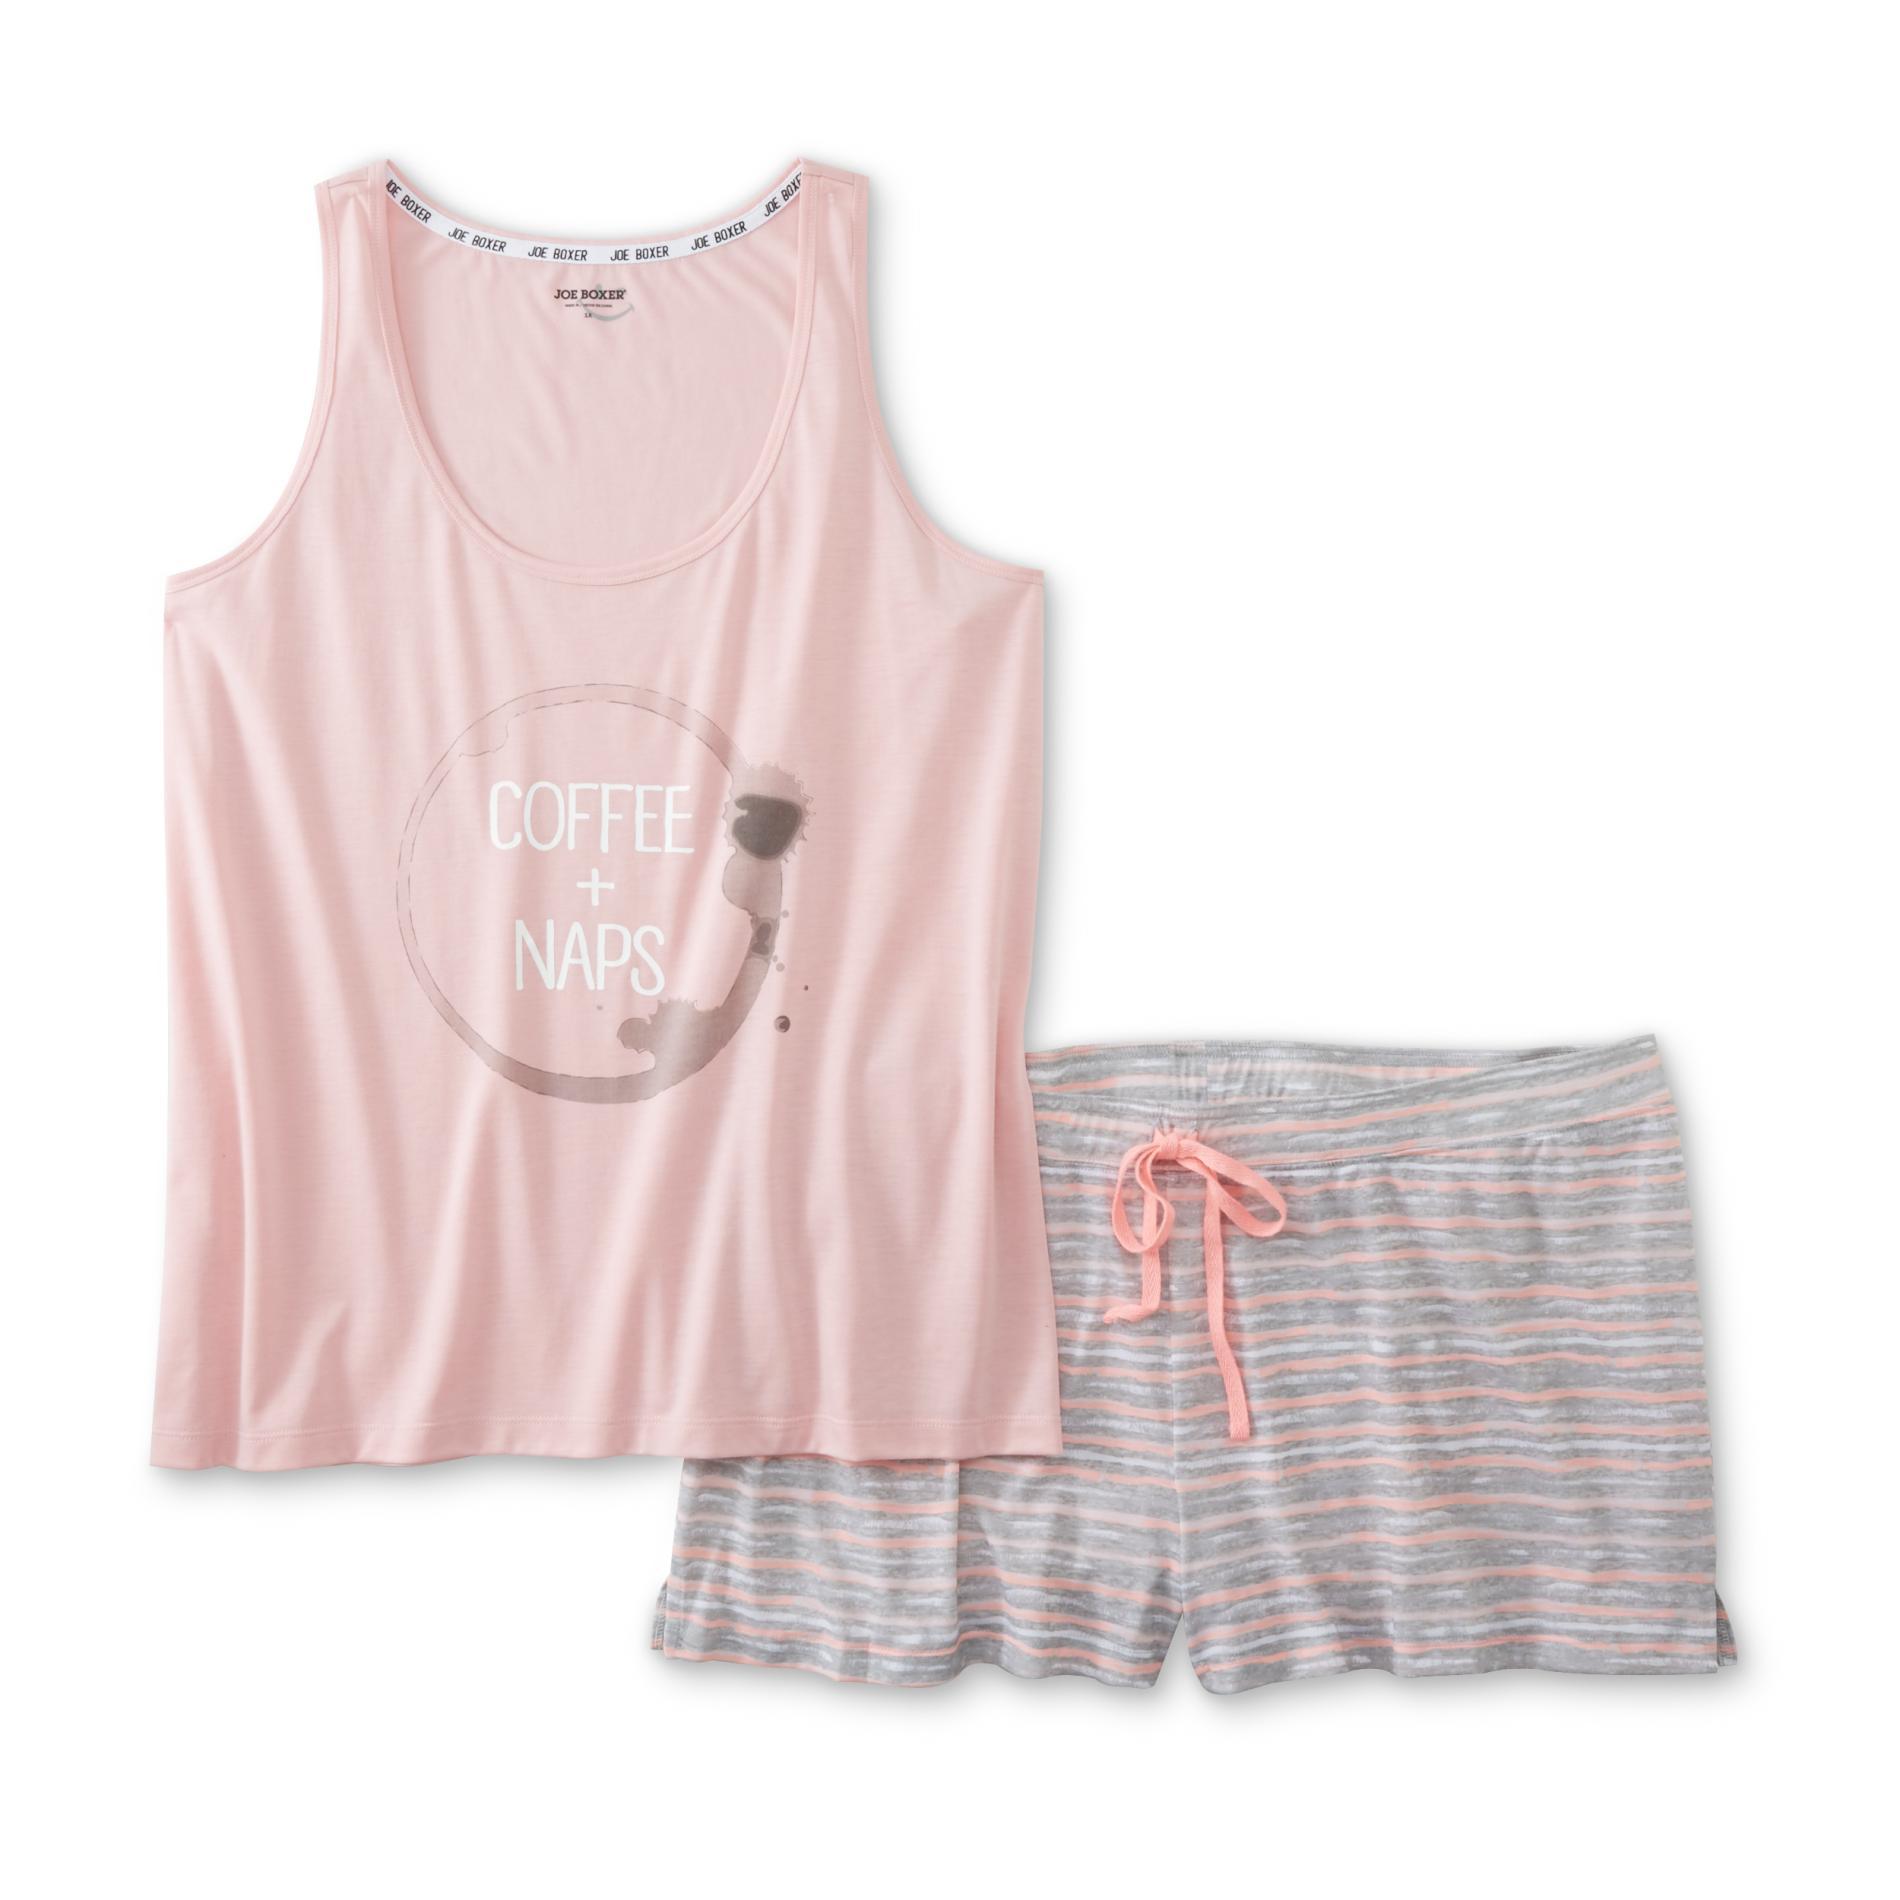 Joe Boxer Women's Plus Pajama Tank Top & Shorts - Coffee & Naps